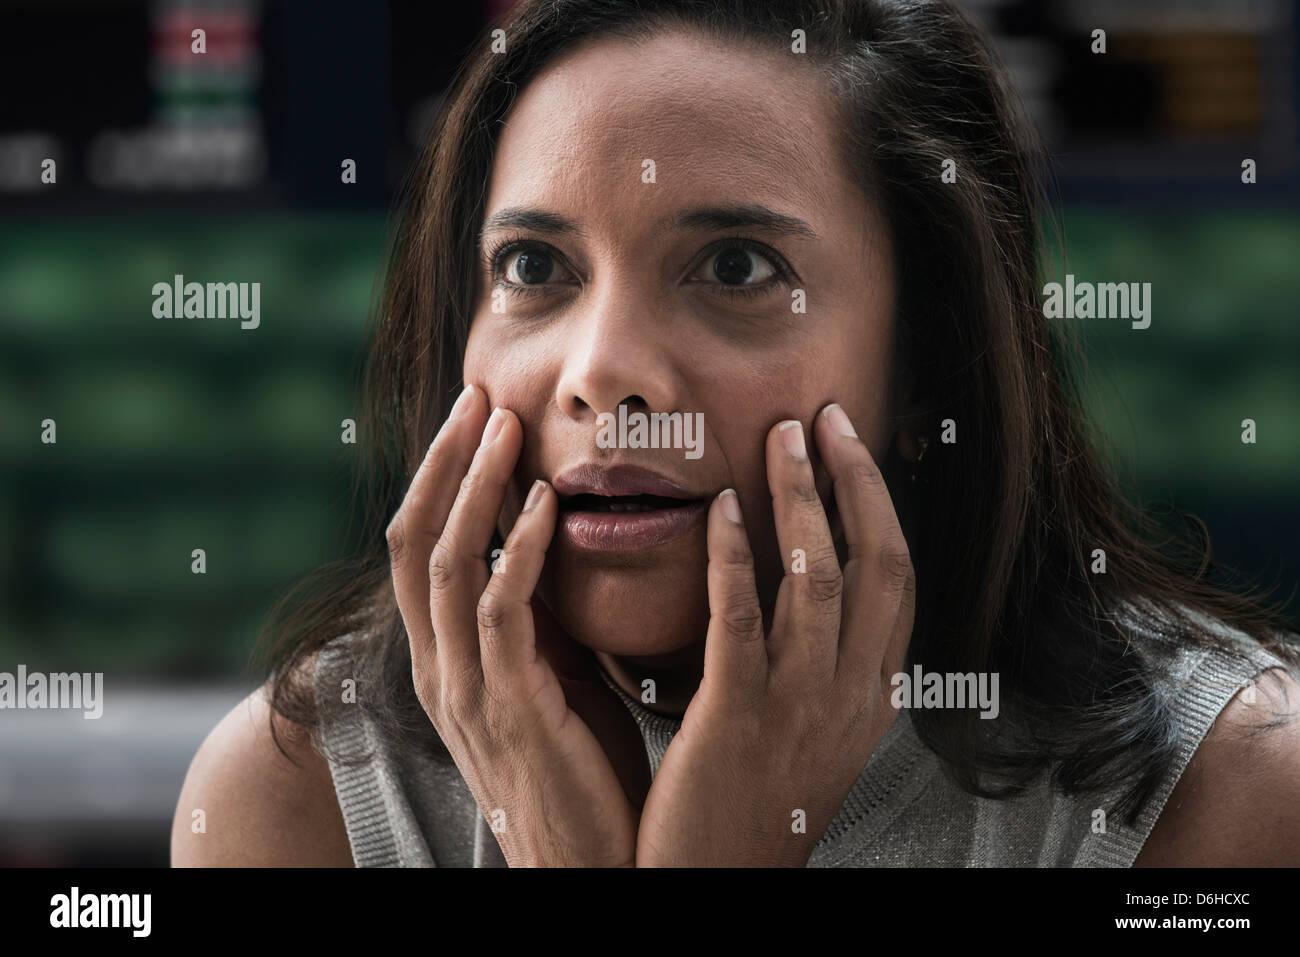 Realisation Woman Stock Photos & Realisation Woman Stock Images - Alamy